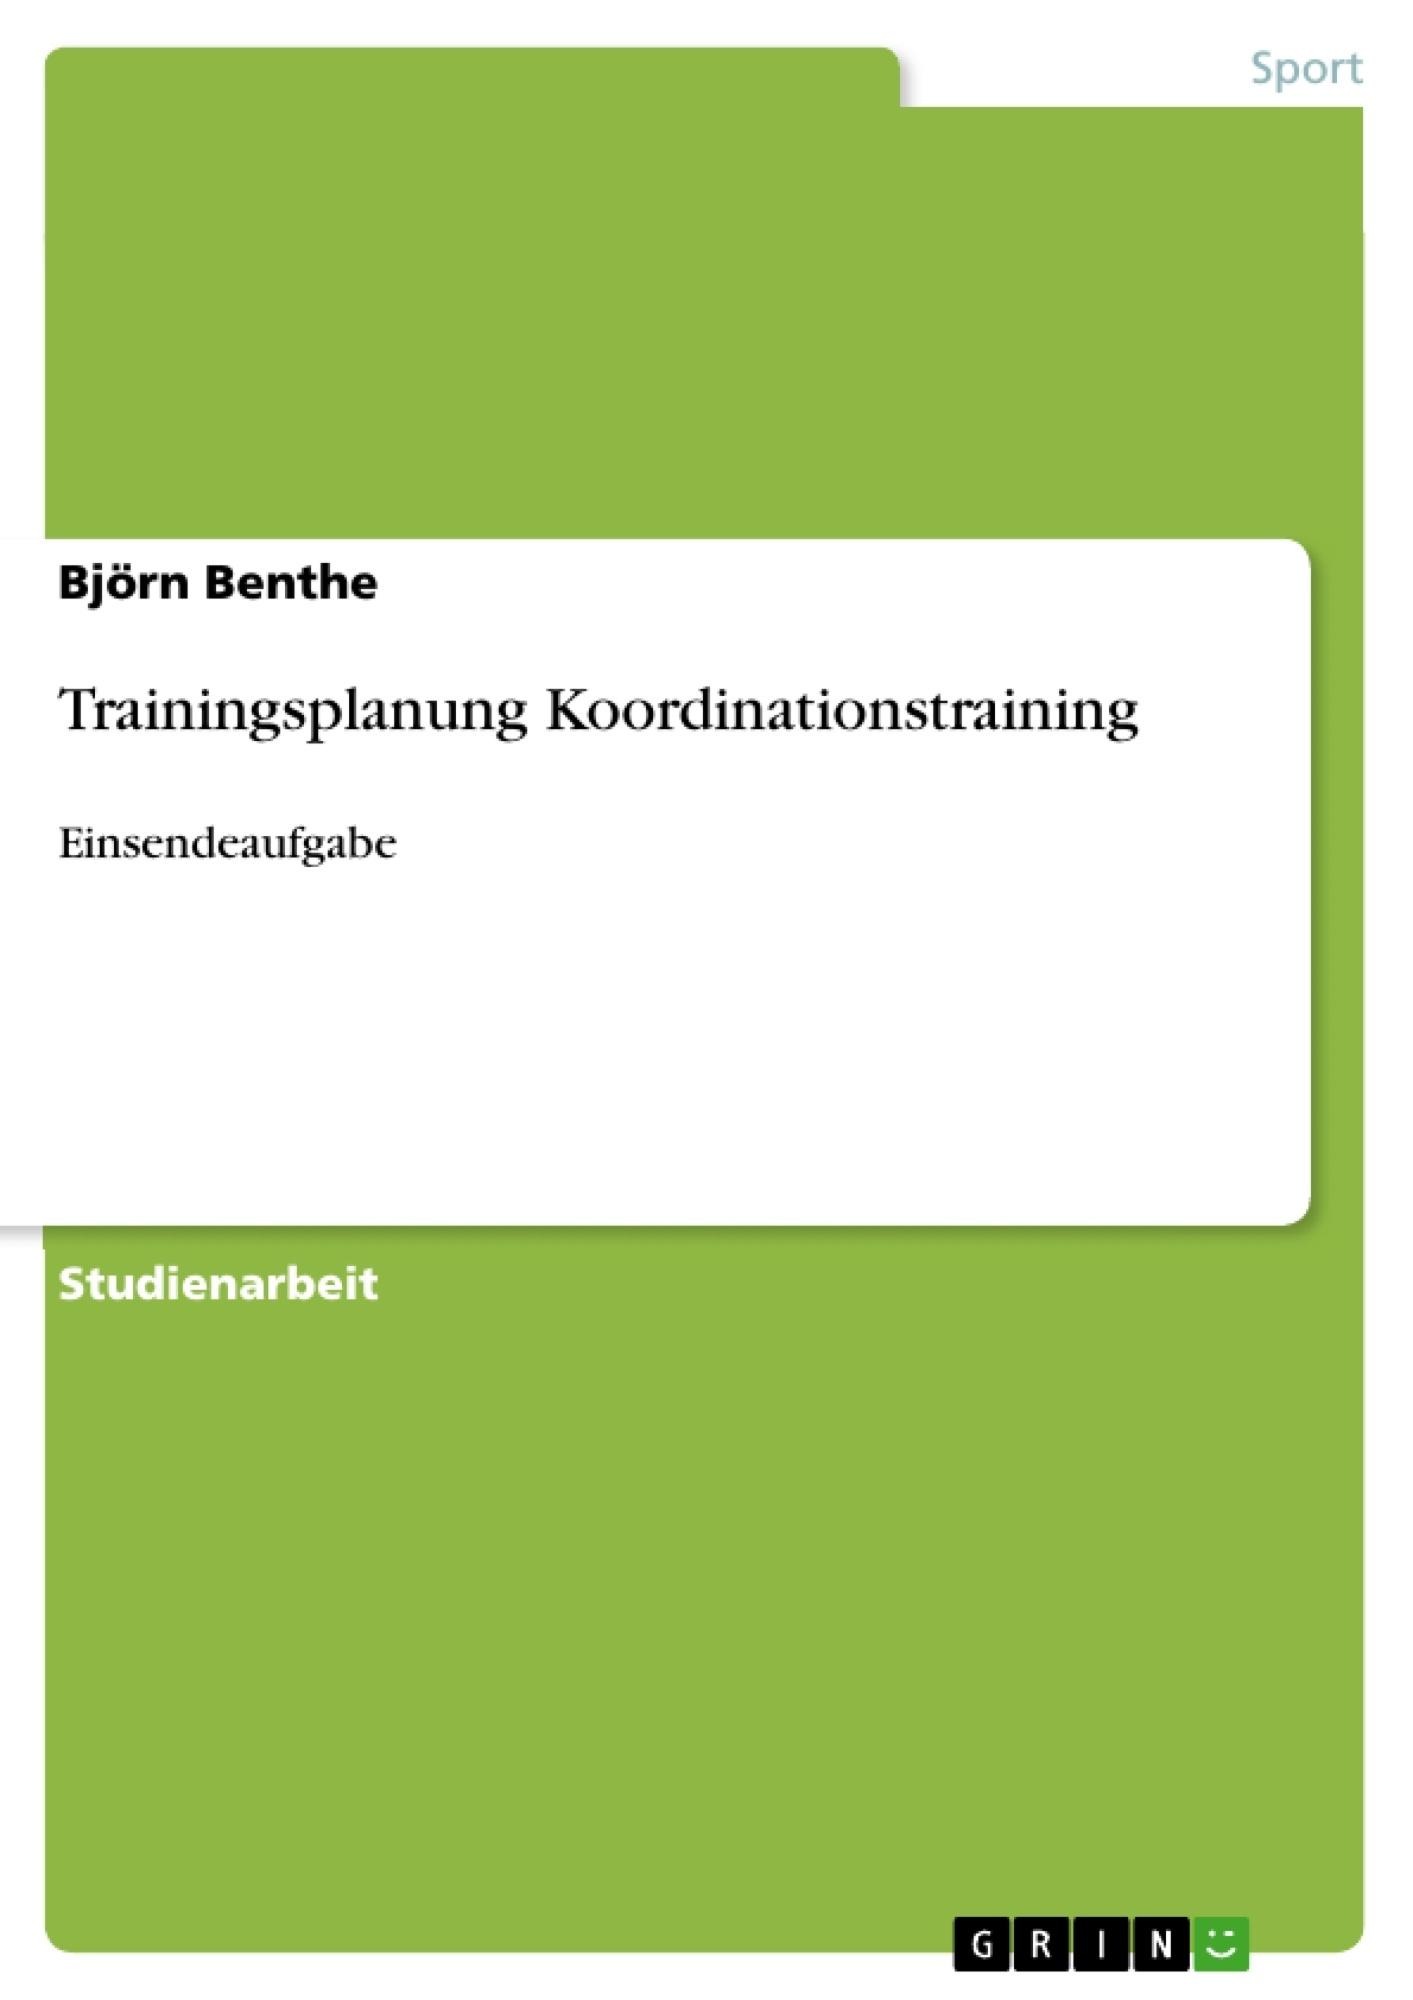 Titel: Trainingsplanung Koordinationstraining